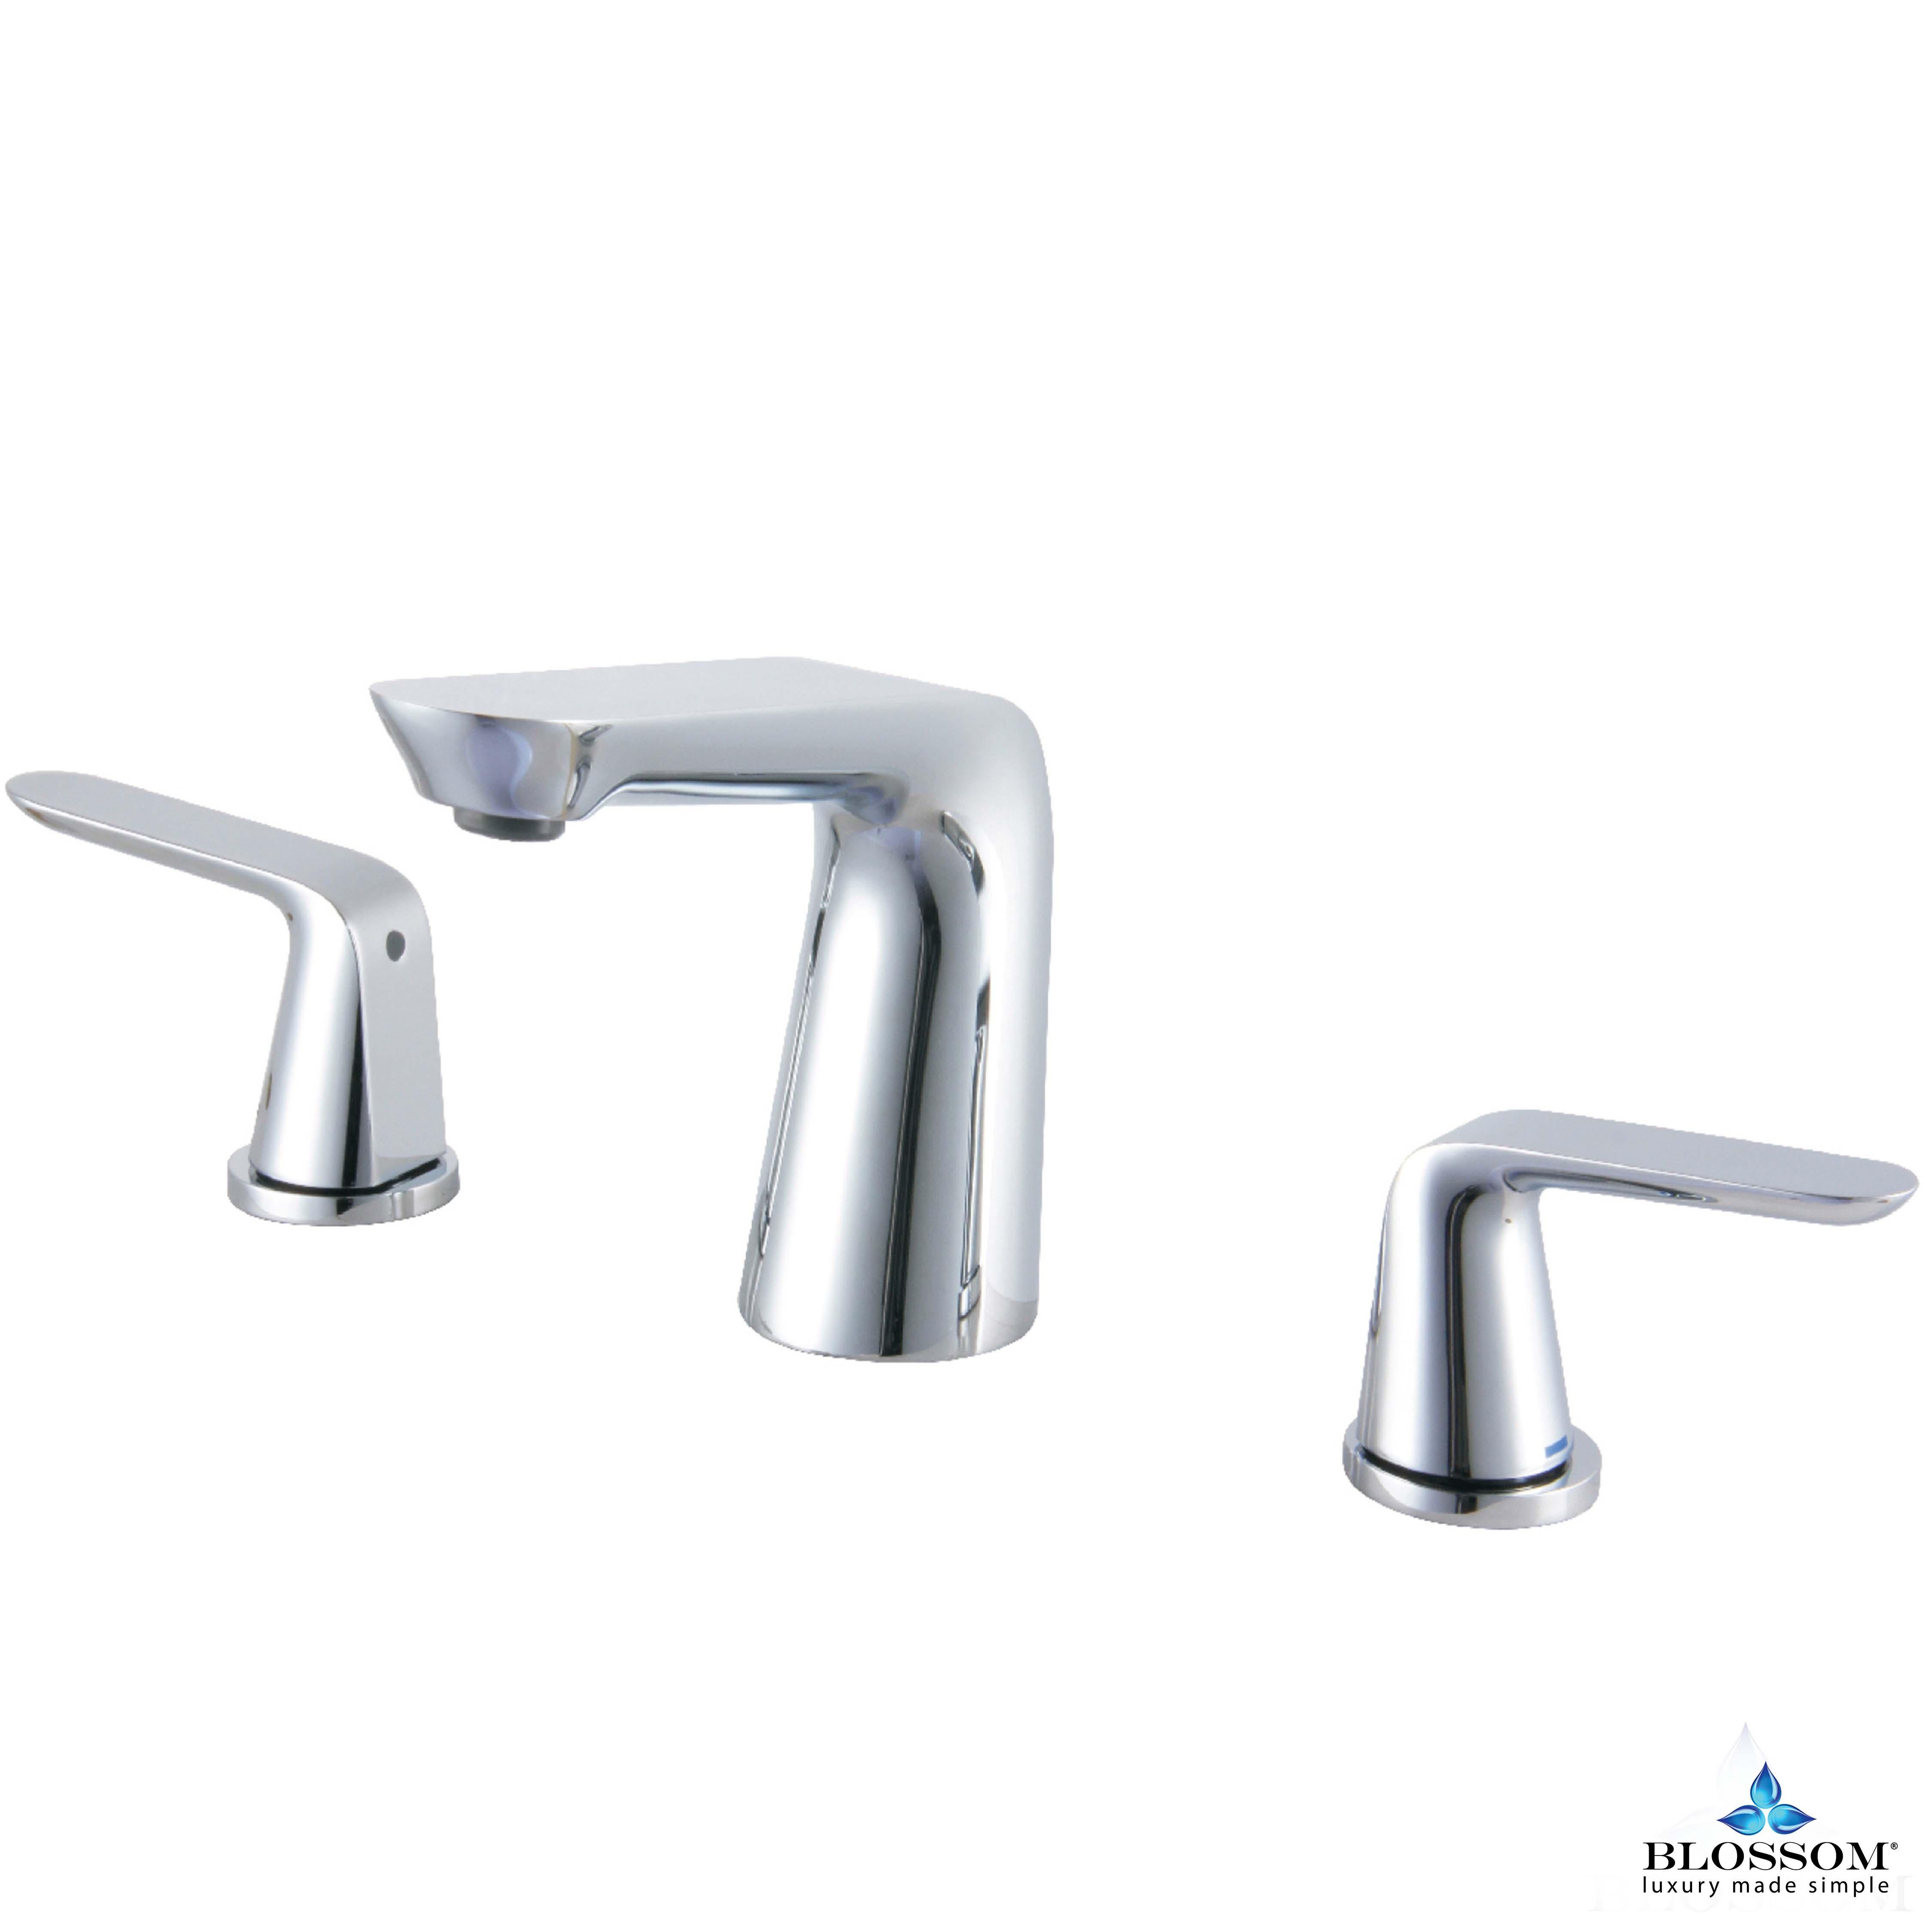 Wide Spread Lavatory Faucet - Chrome - F01 107 01 ...